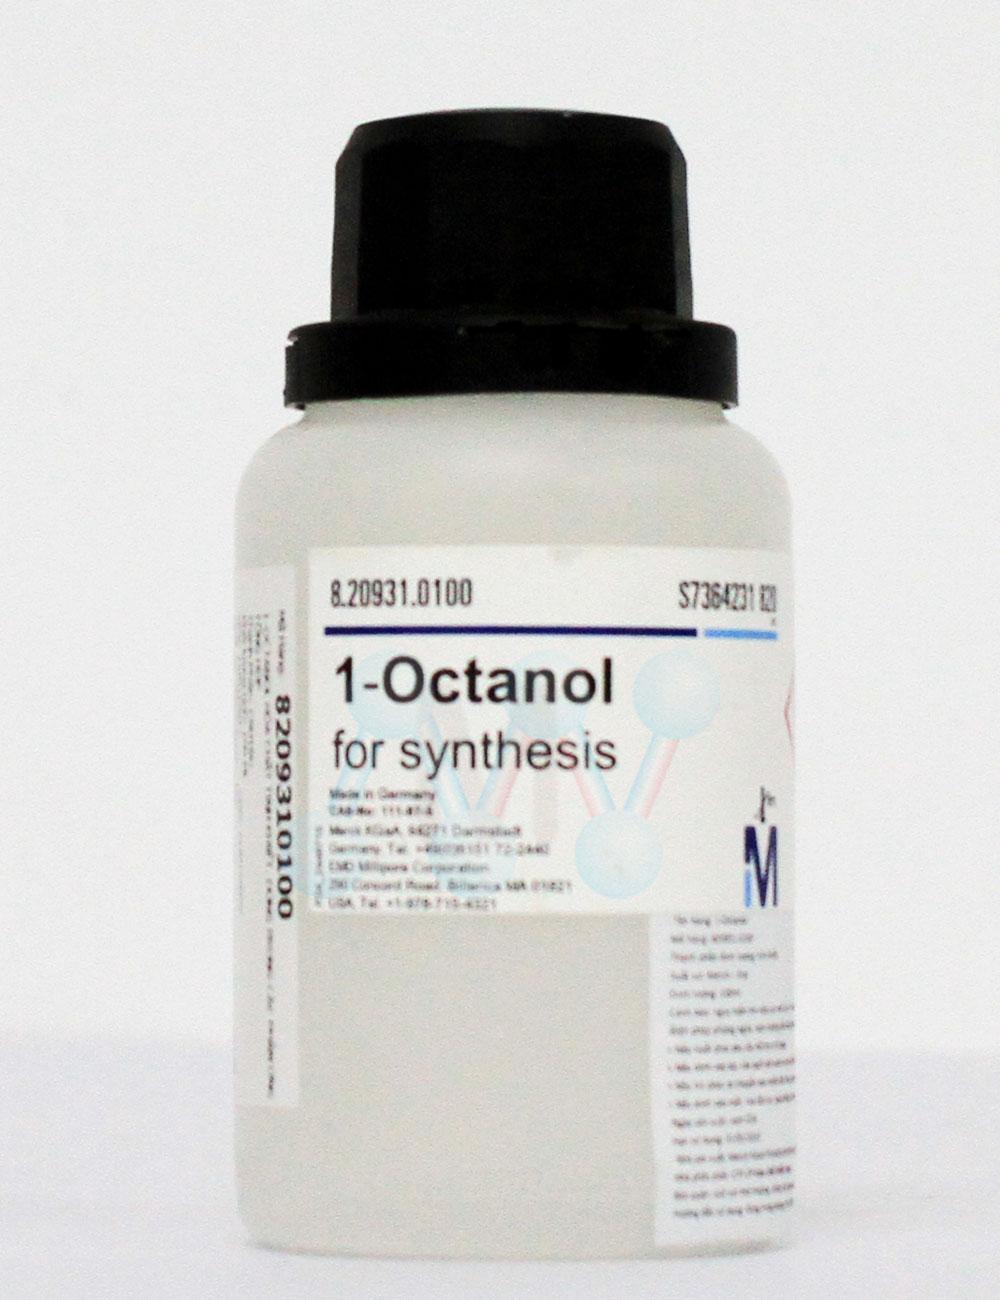 1-Octanol C8H18O